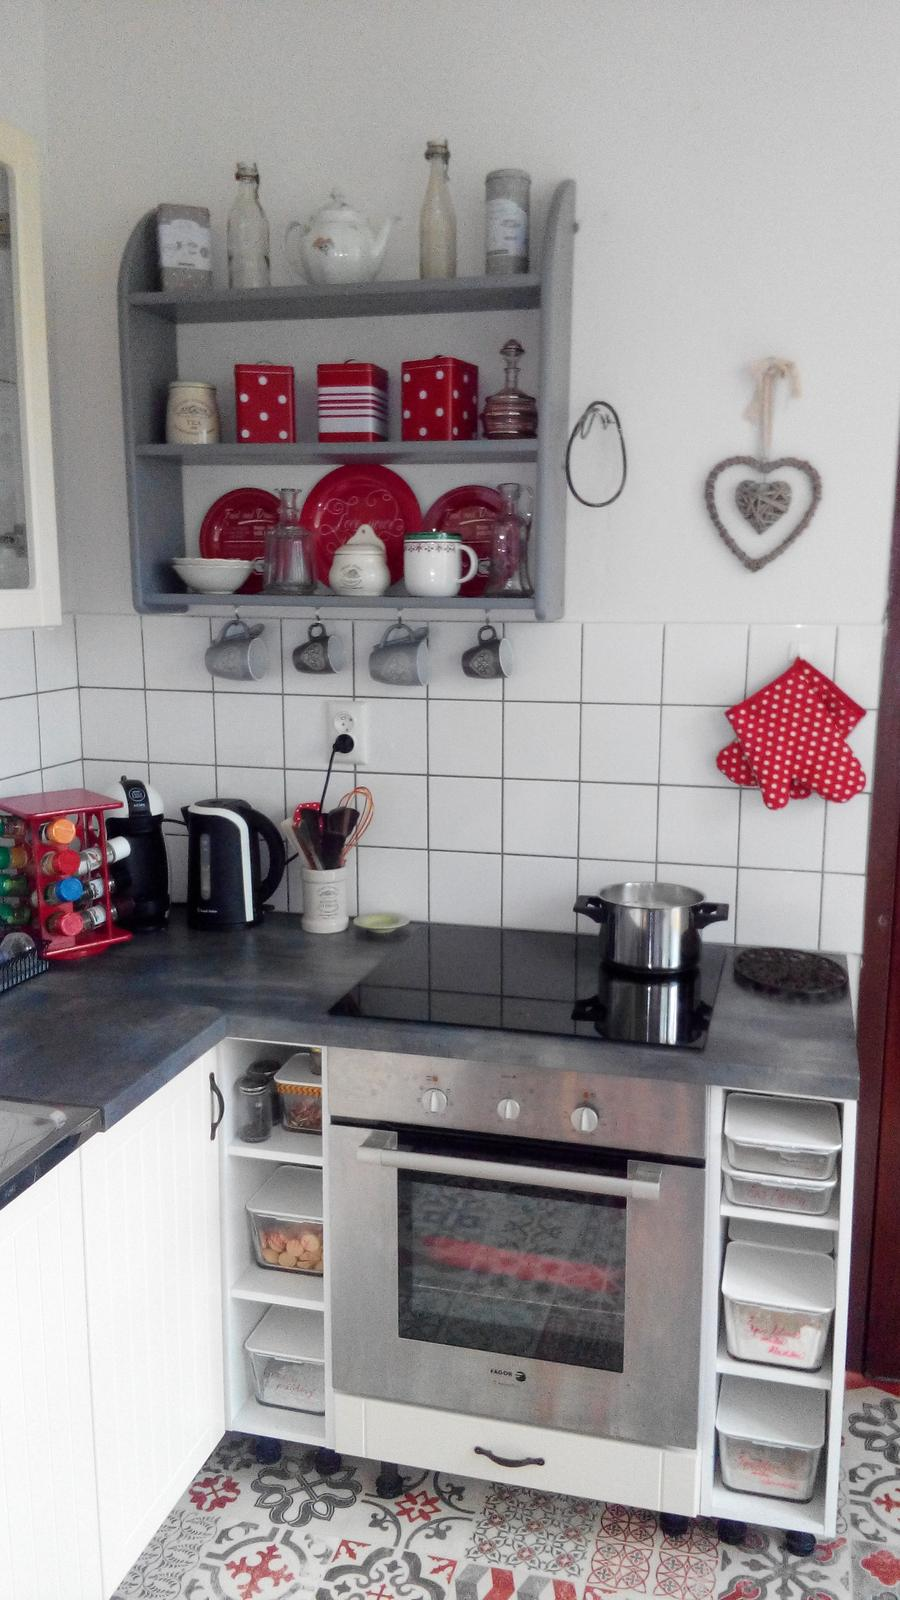 Kuchyňa - Tu som to tiez prehodila a pribudlo srdiecko